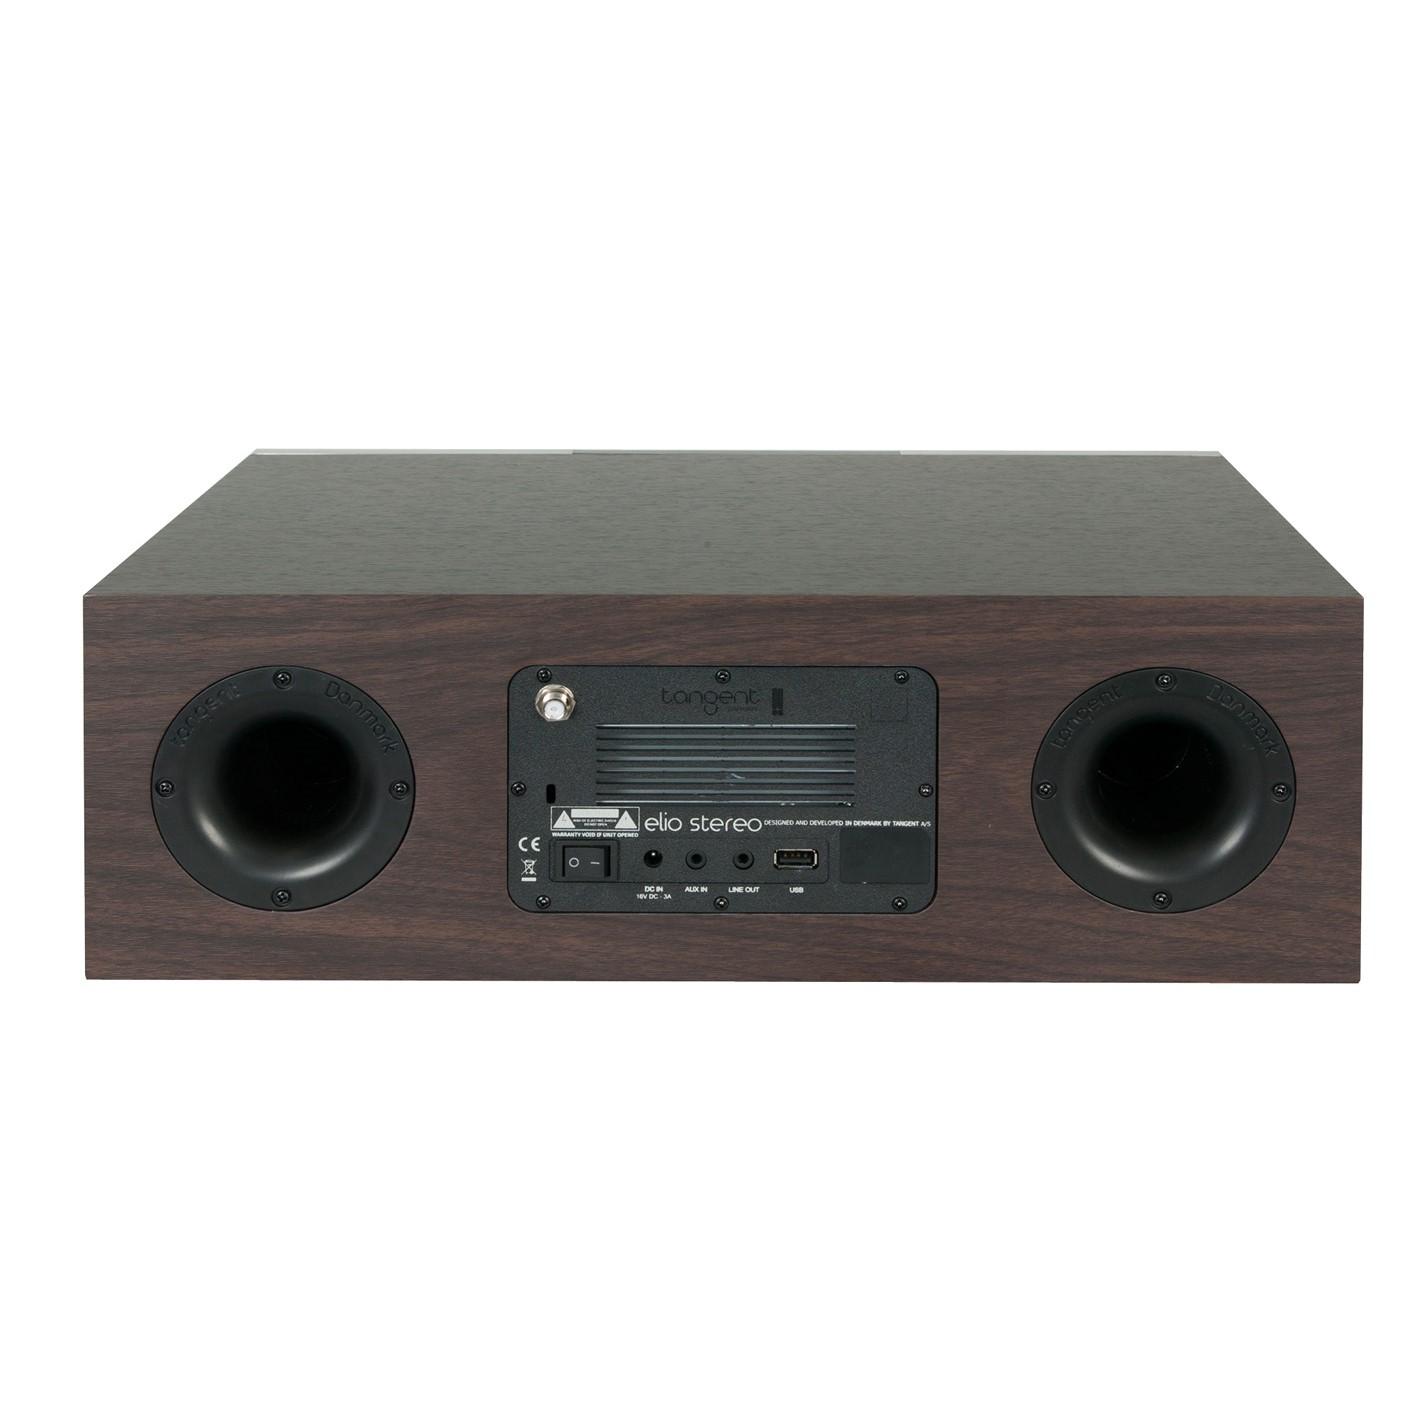 Tangent Elio stereo Orah